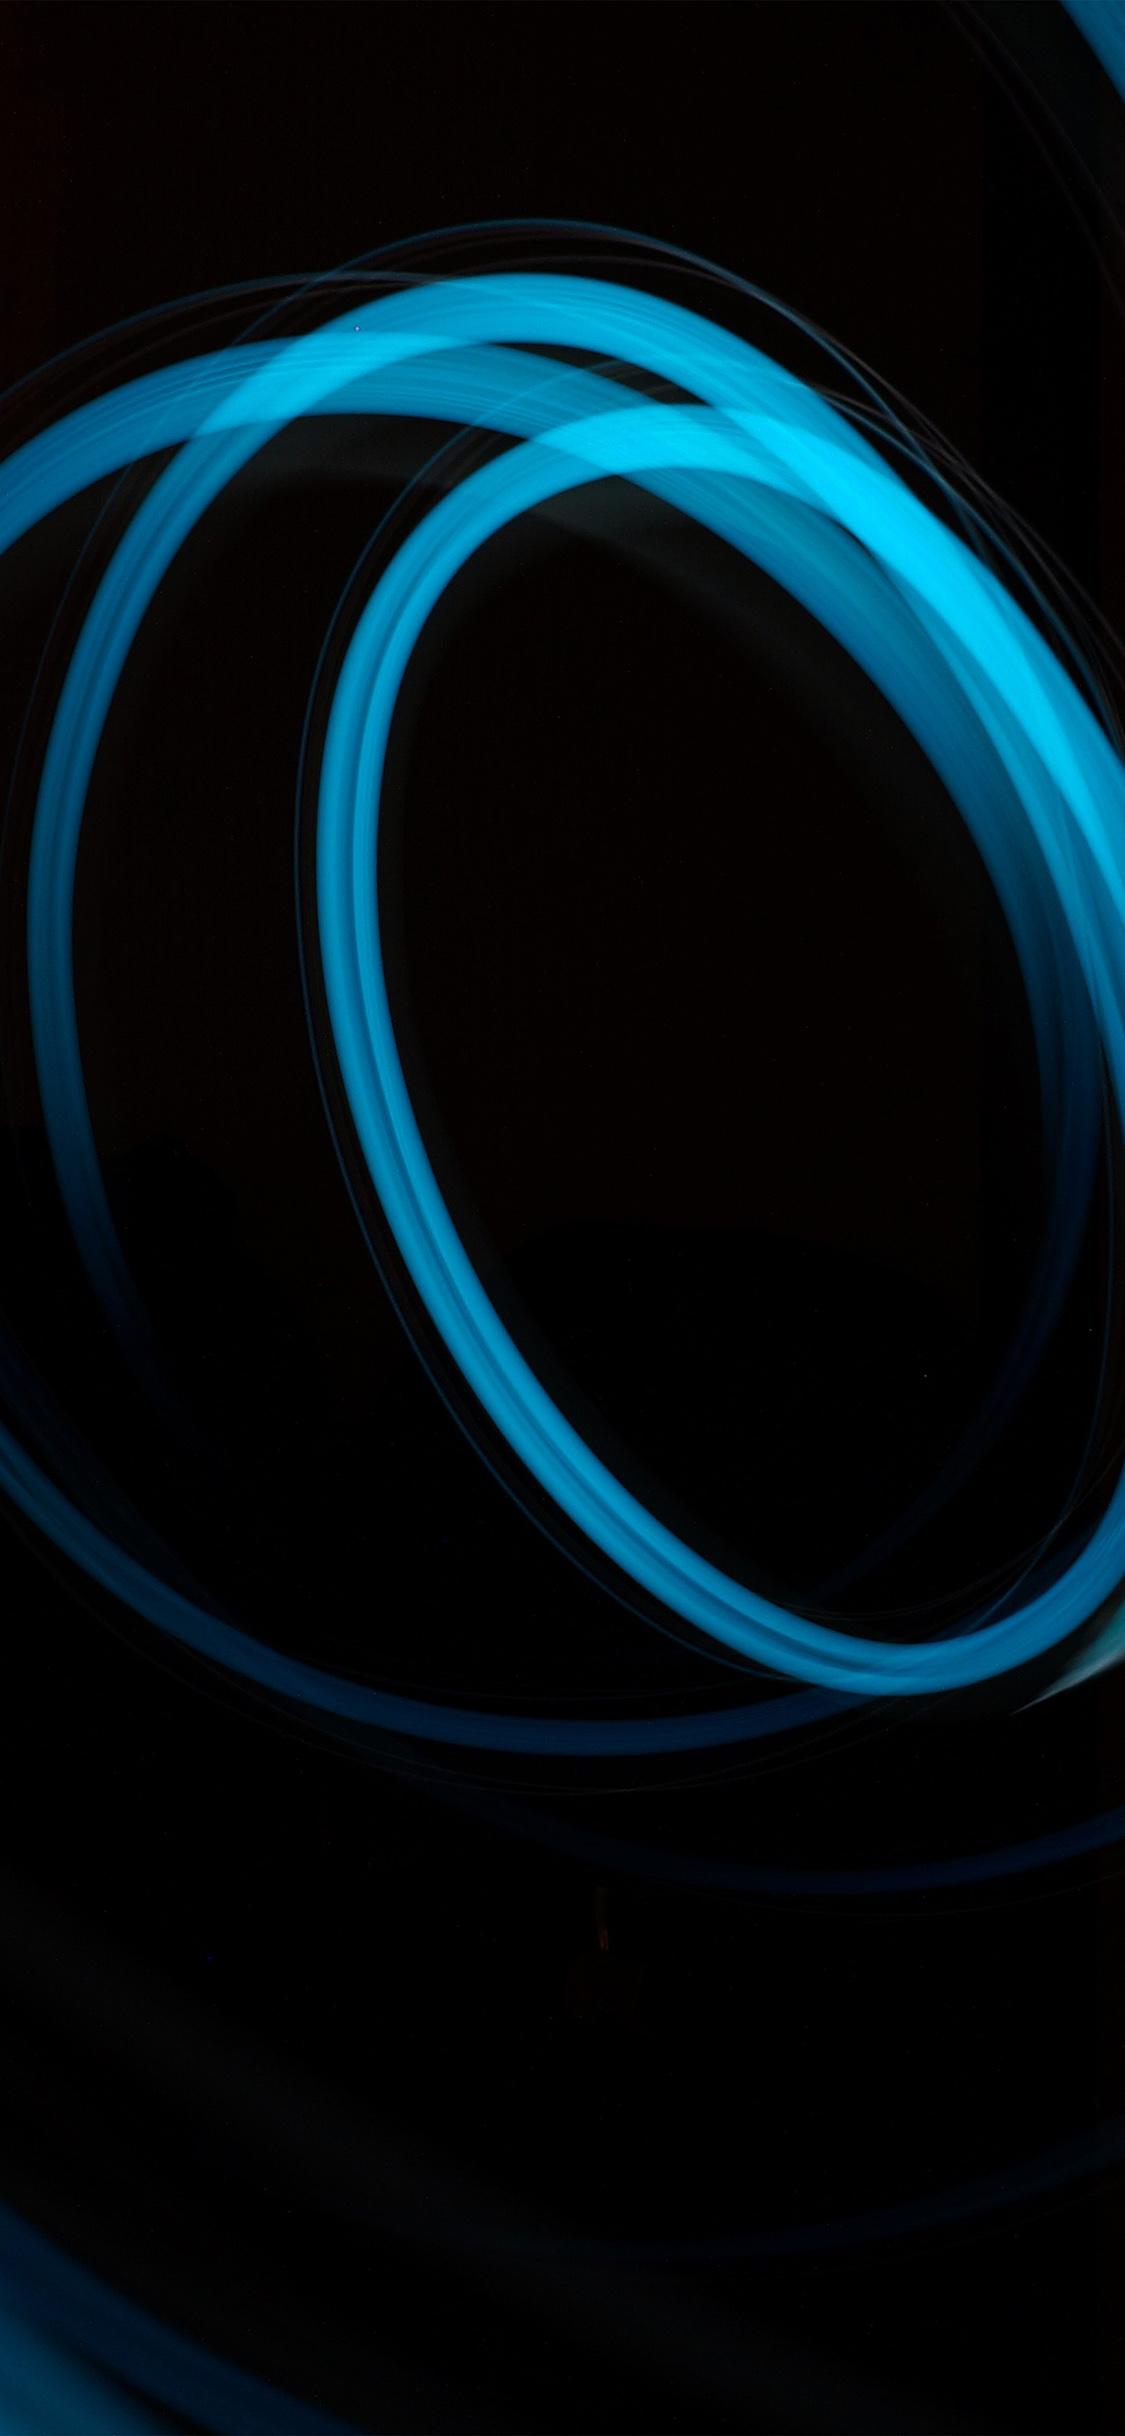 iPhoneXpapers.com-Apple-iPhone-wallpaper-vo46-circle-light-dark-blue-pattern